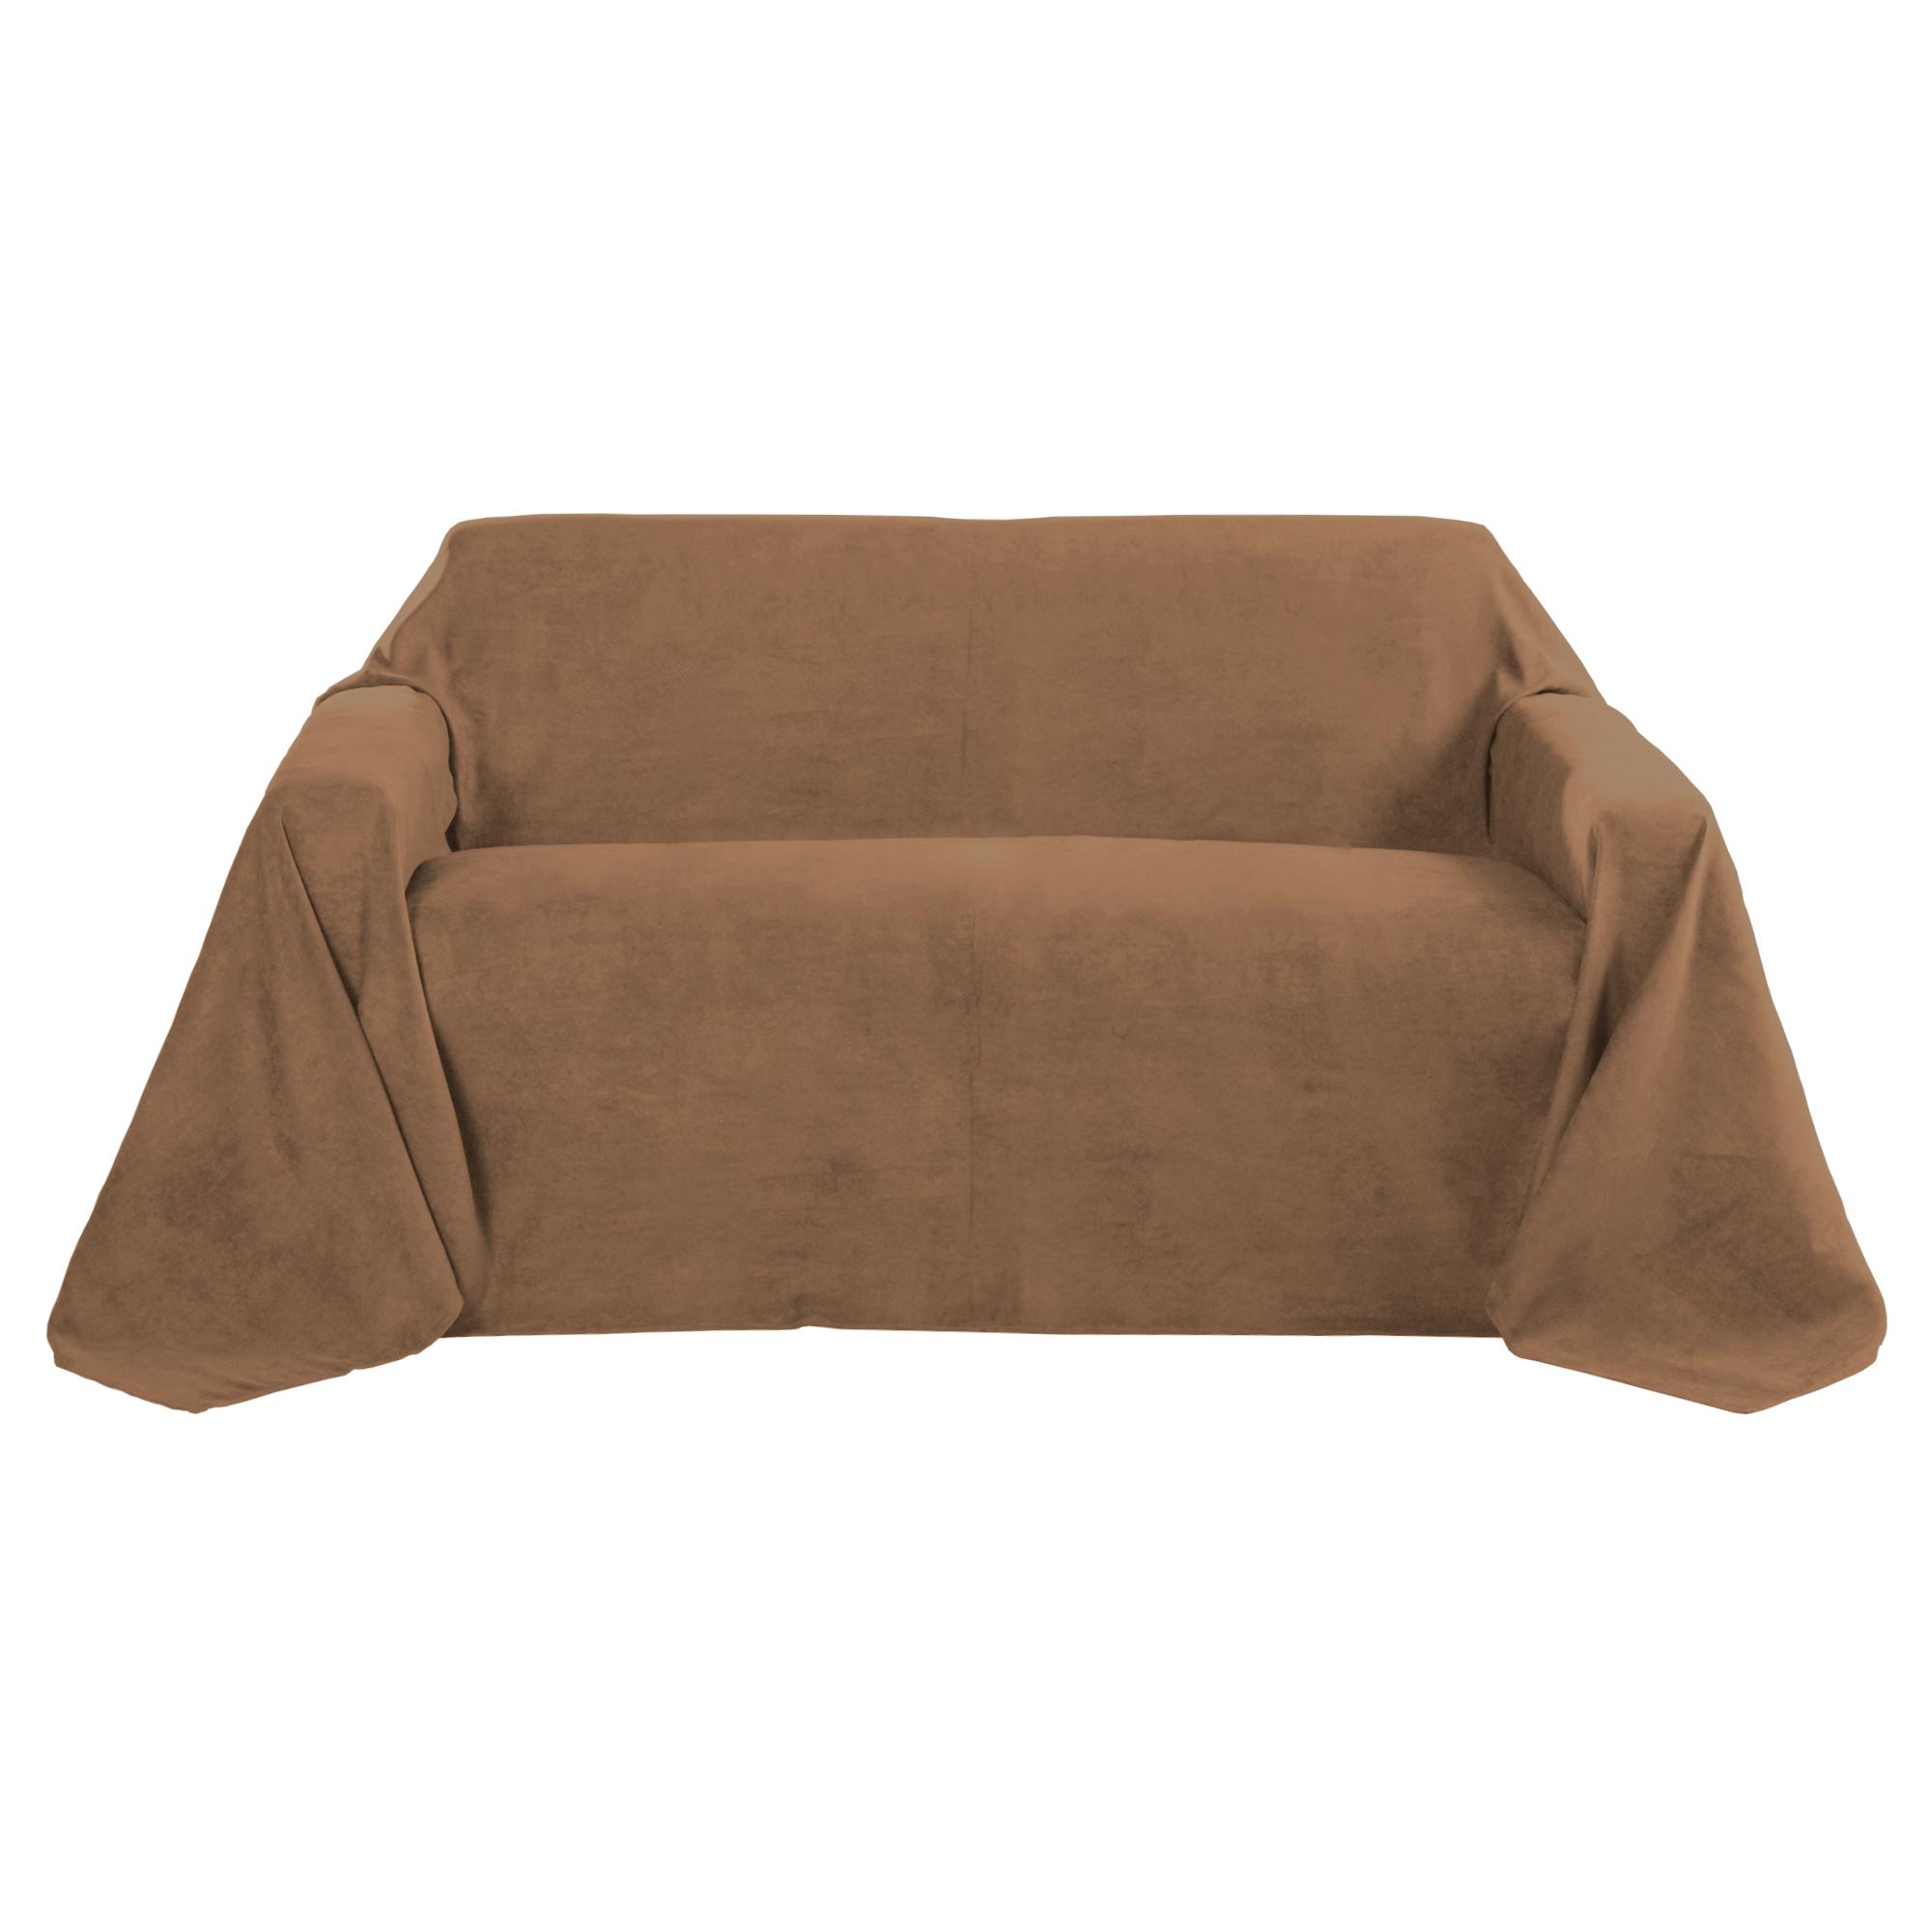 Tagesdecke-Sofaueberwurf-210x280-cm-Plaid-Bettueberwurf-Sofa-Couch-Uberwurf-Decke